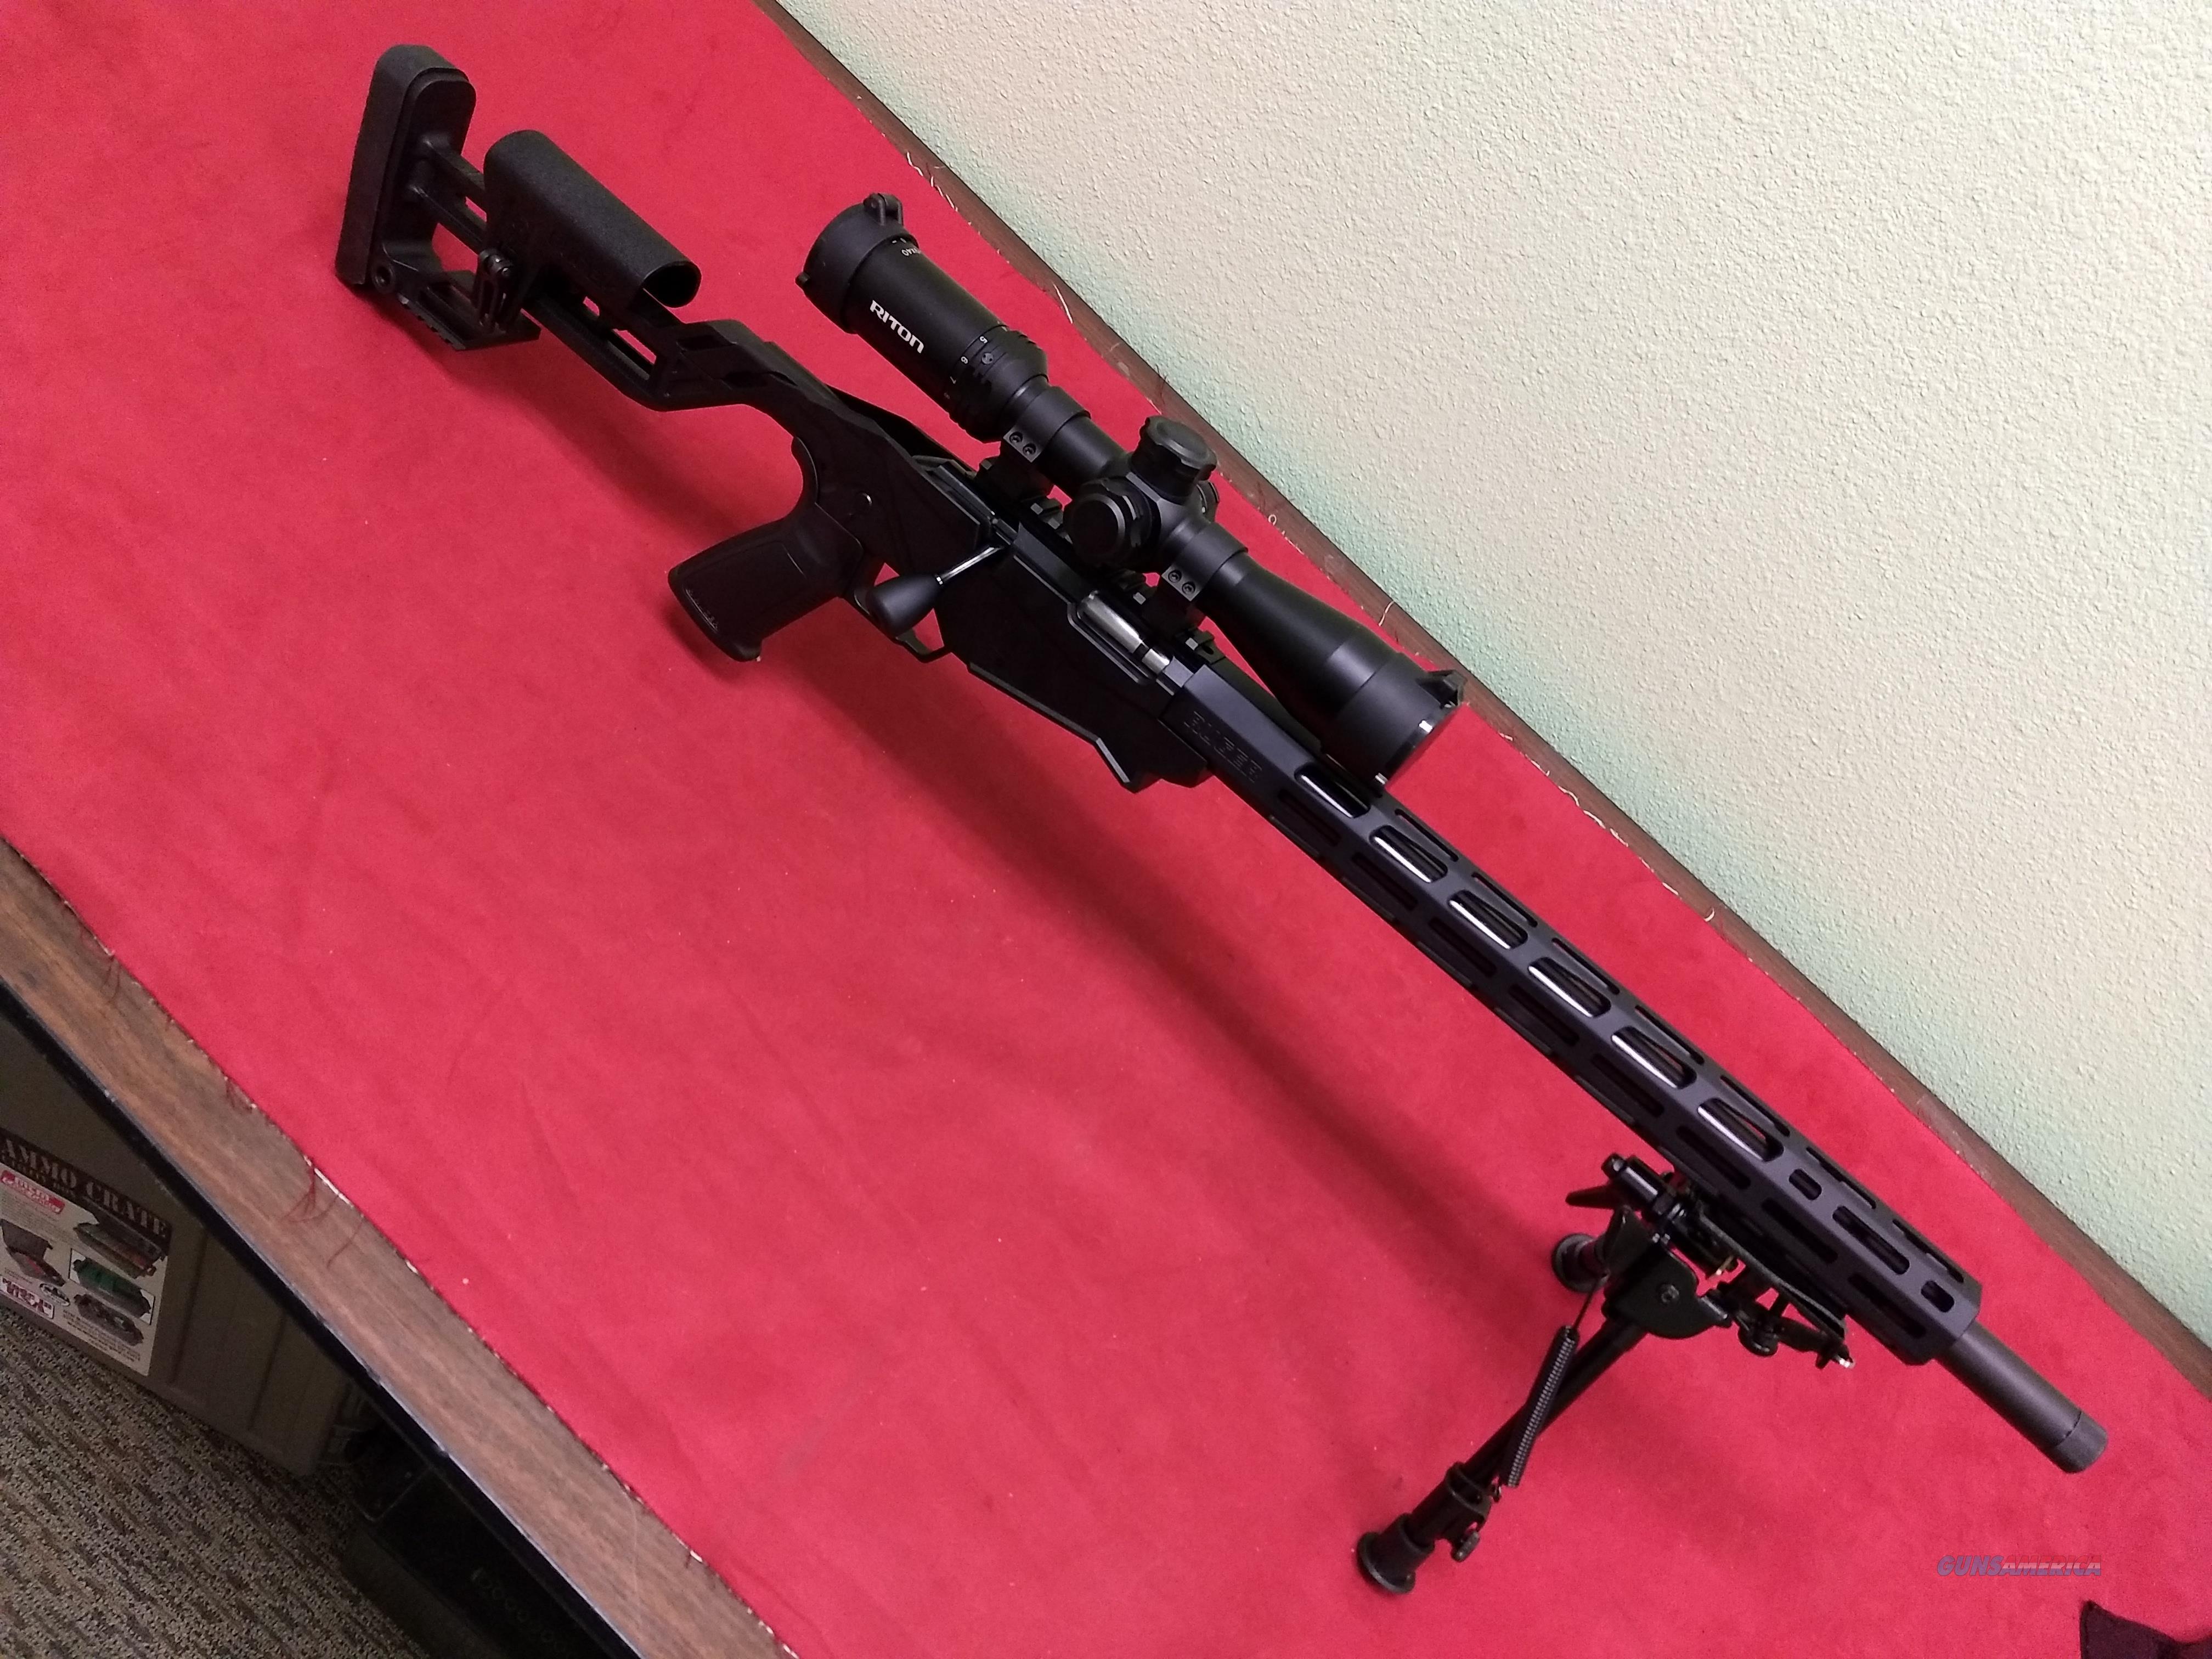 Ruger Precision Rimfire Rifle, .22 LR, NIB, w/Cliff's Package Deal!  Guns > Rifles > Ruger Rifles > Precision Rifle Series